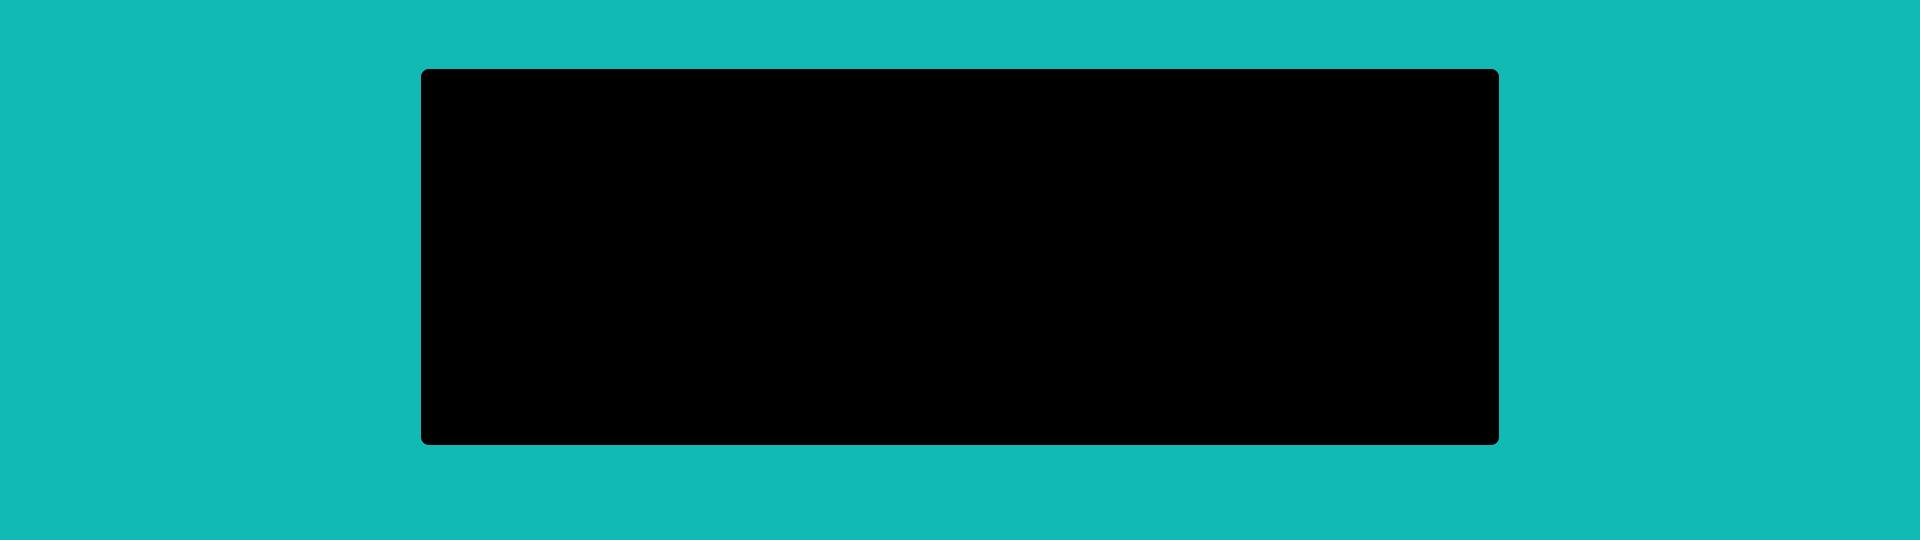 CATEGORY-TEL-KISINDIRIMITELEFONJENERIK-23-02